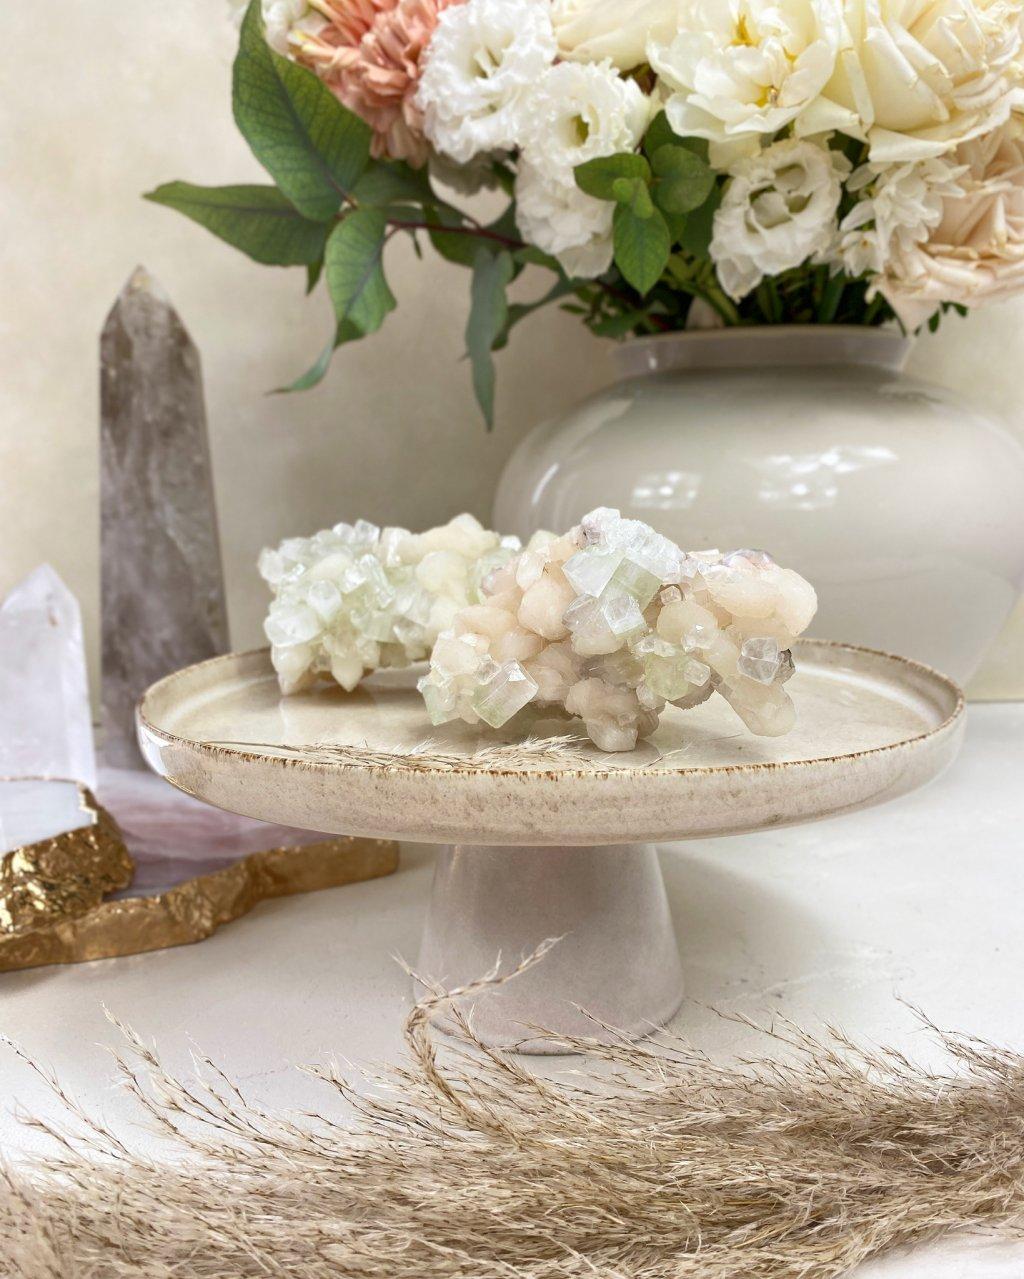 Drahé kameny apofylit drúza Indie AAA kvalita